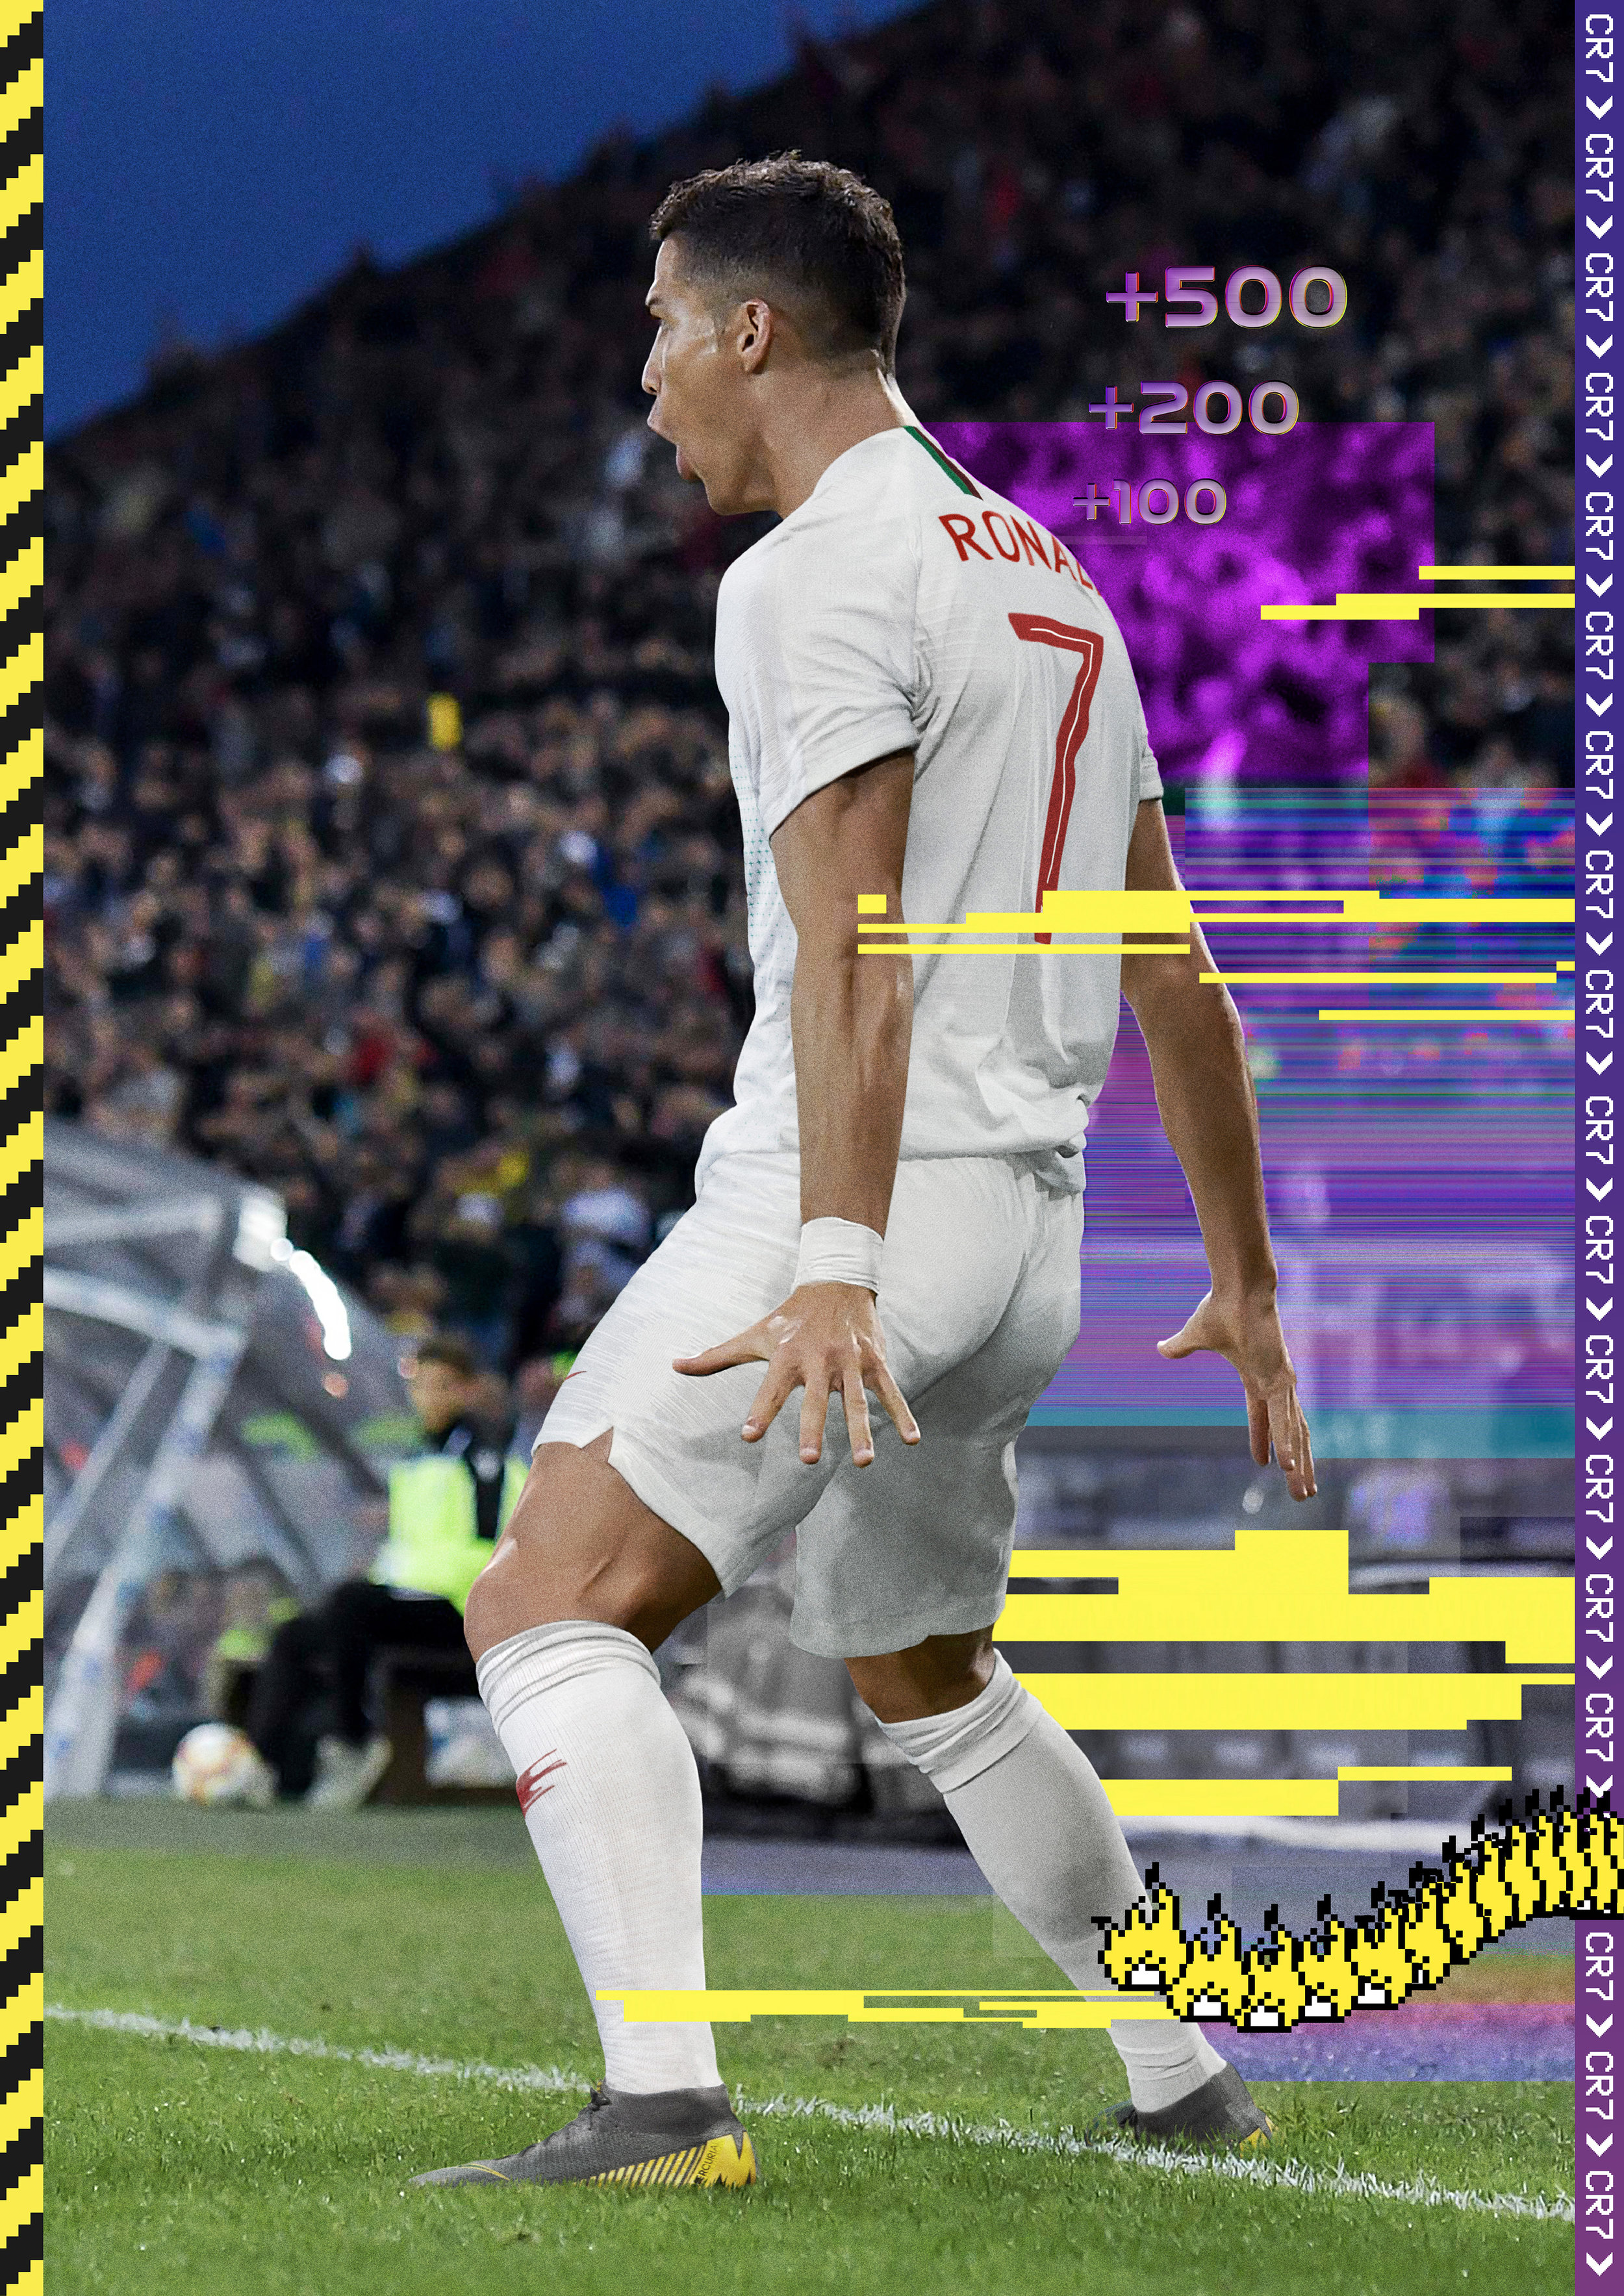 SP19_GFB_GameOver_Athlete_InGame_CR7_TheCelebration_Treated+Emojis.jpg